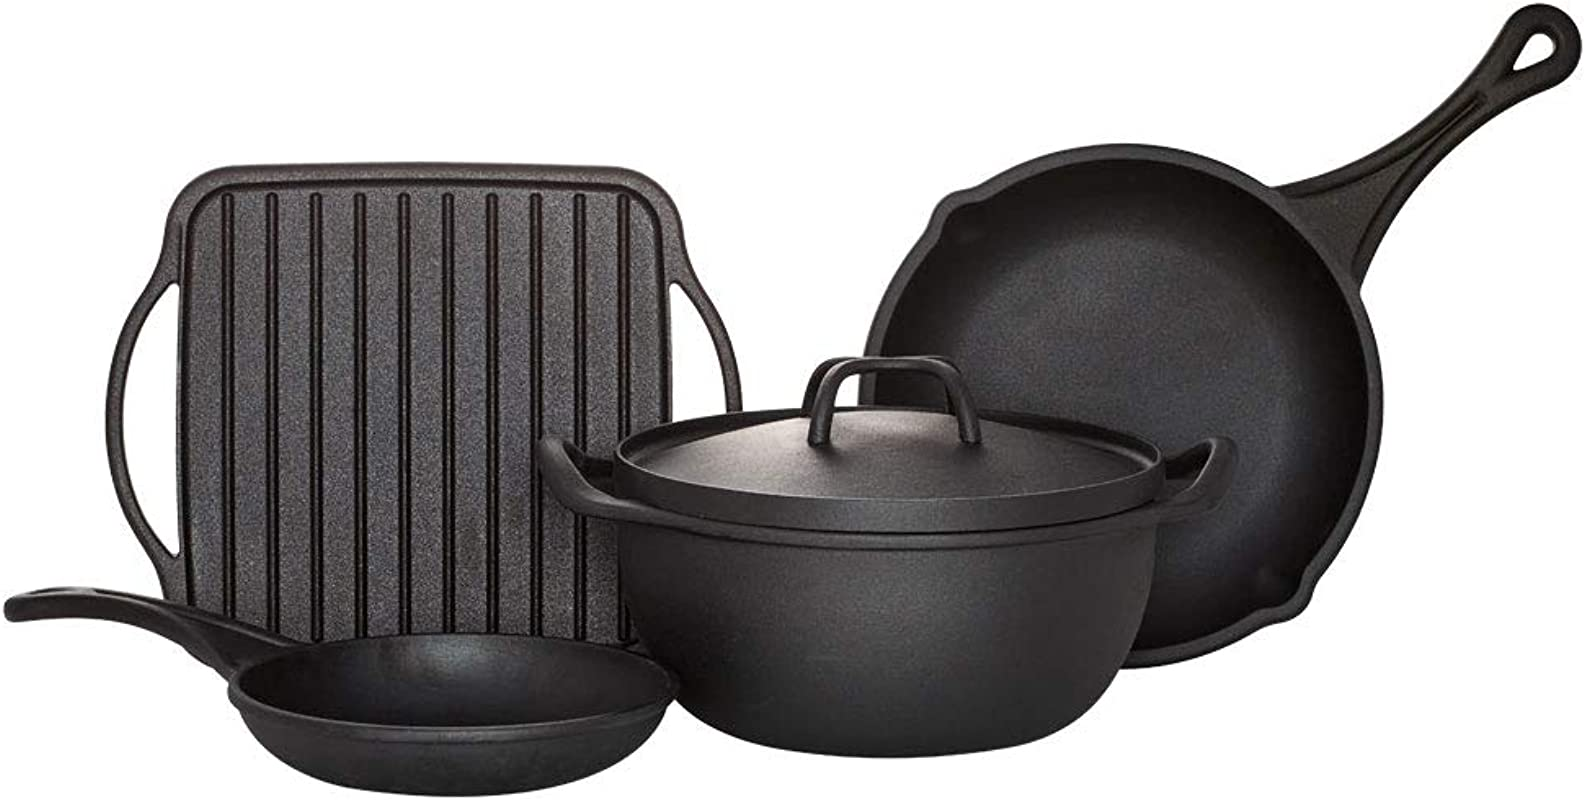 Sabatier 5192254 Rust Resistant Pre Seasoned Cast Iron Pans Various Black